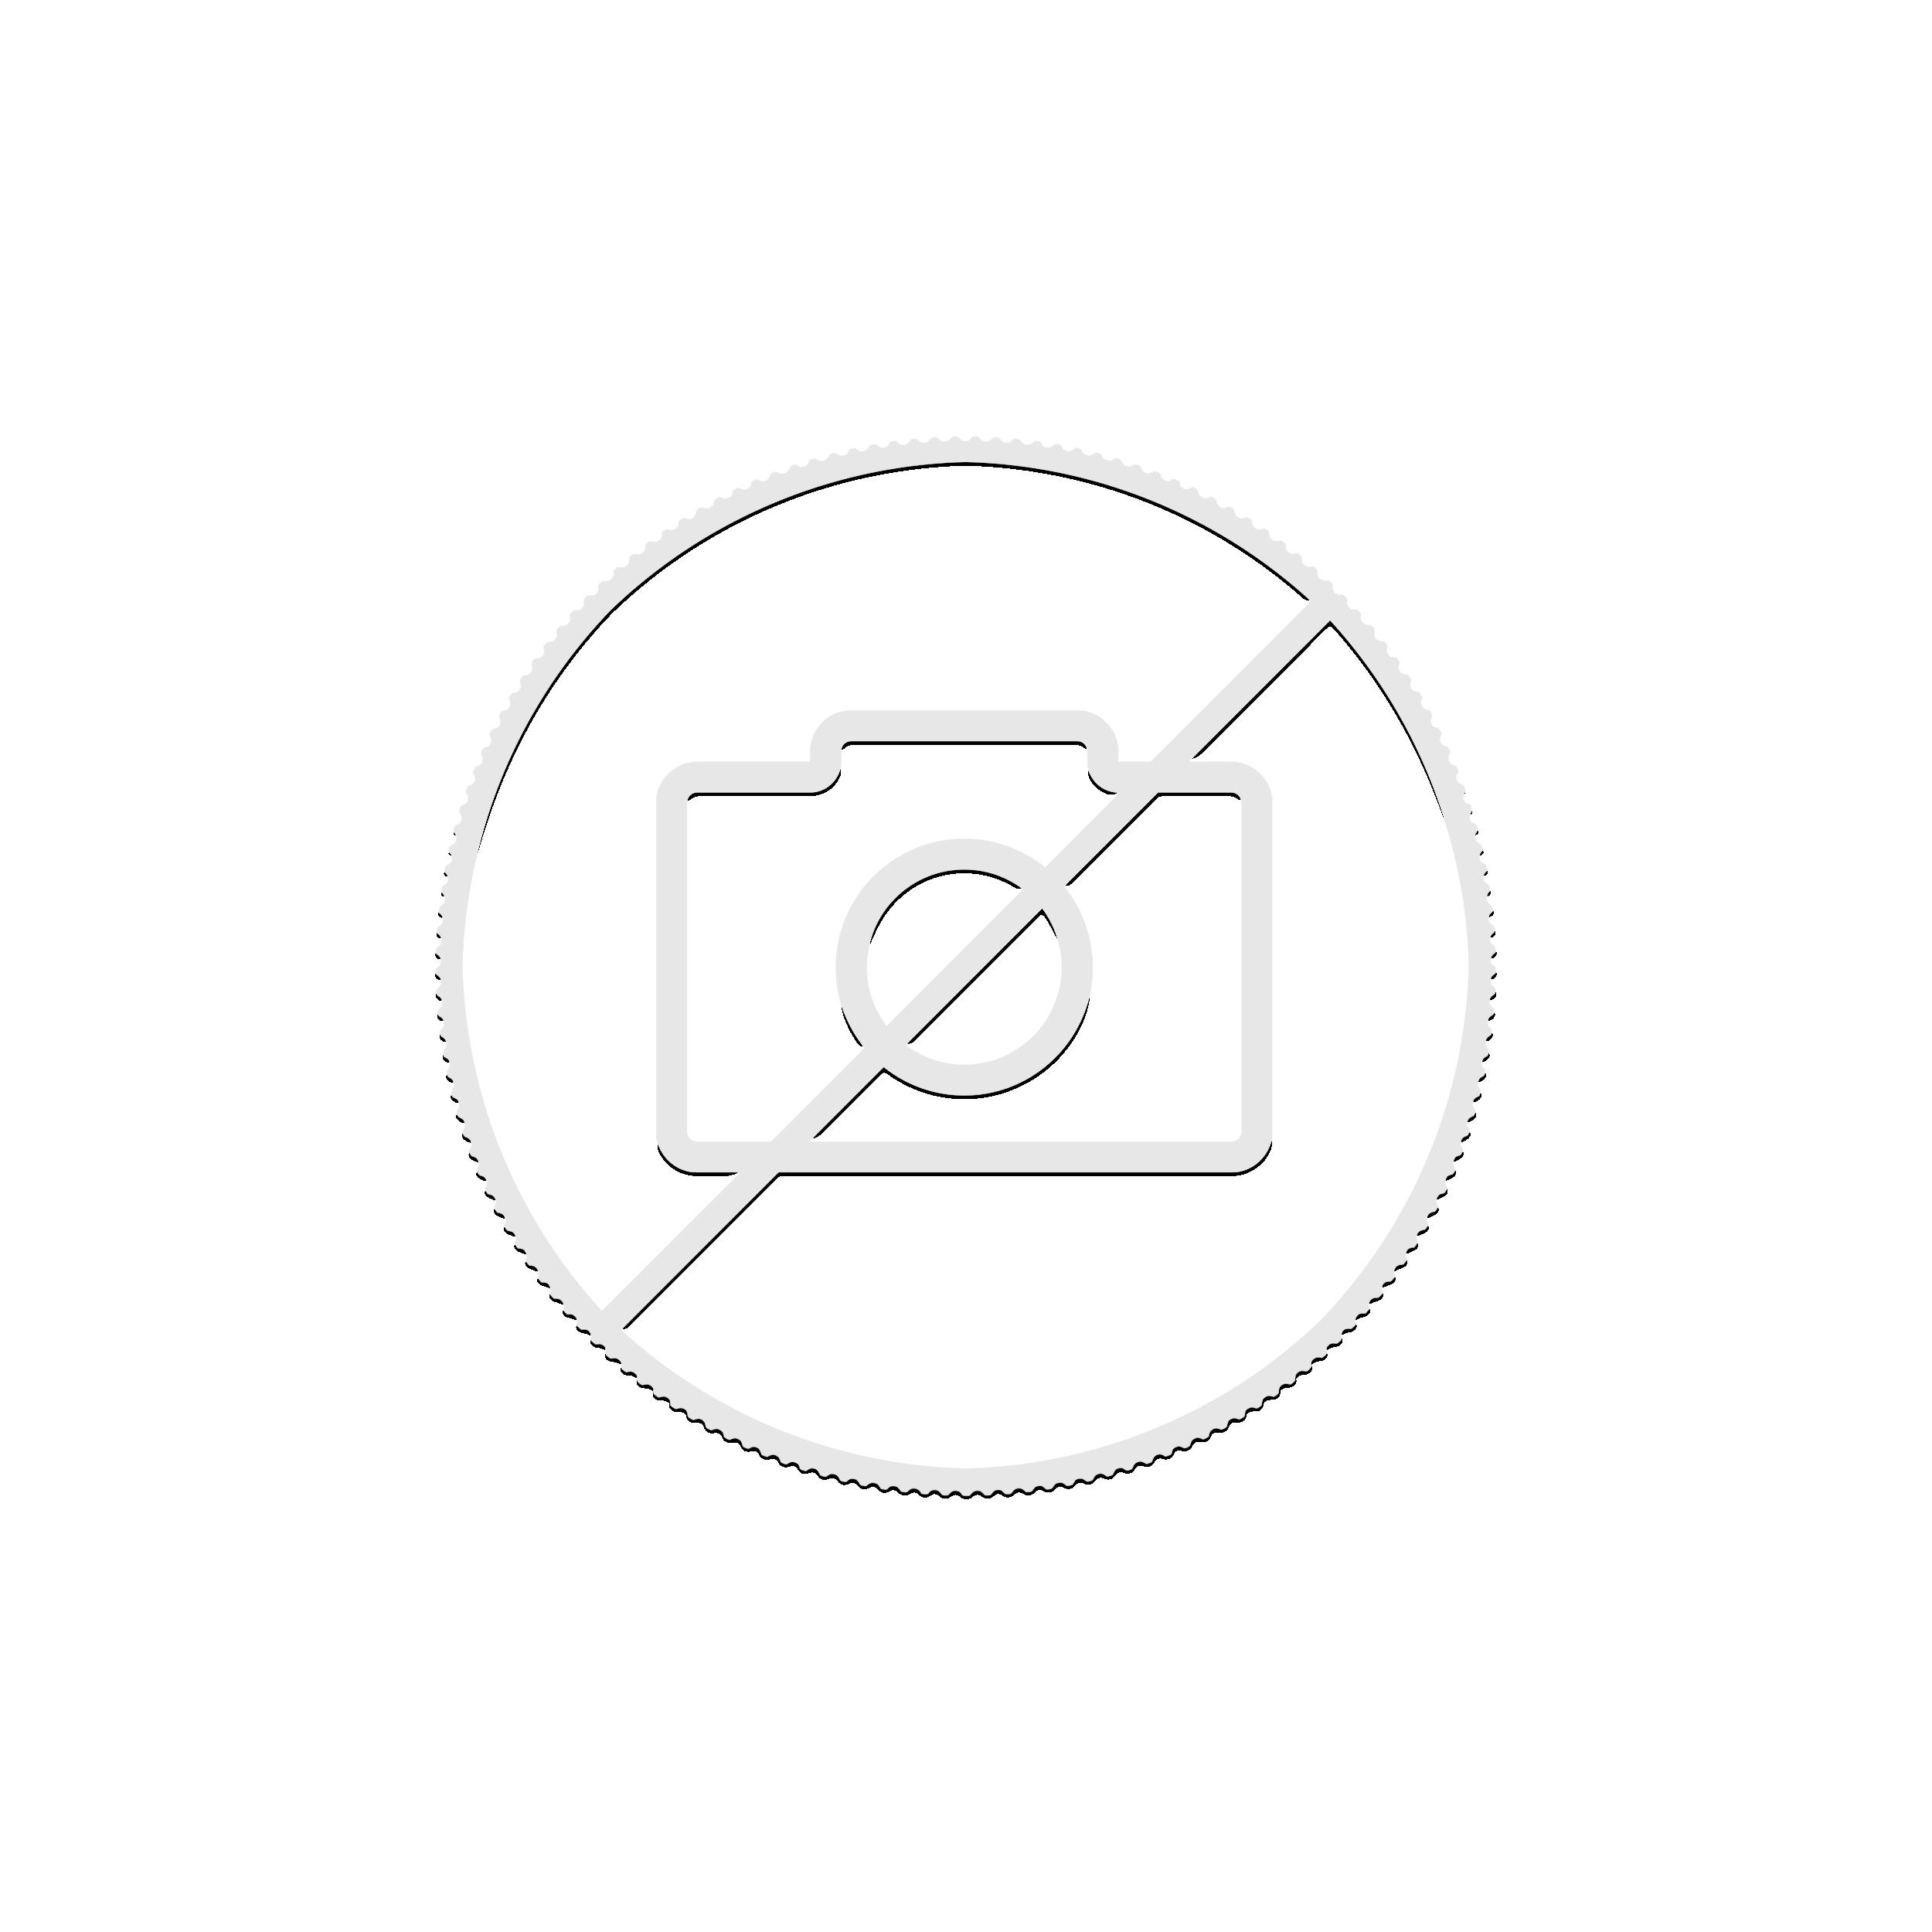 1 Troy ounce zilveren munt Golden Ring - Britannia 2019